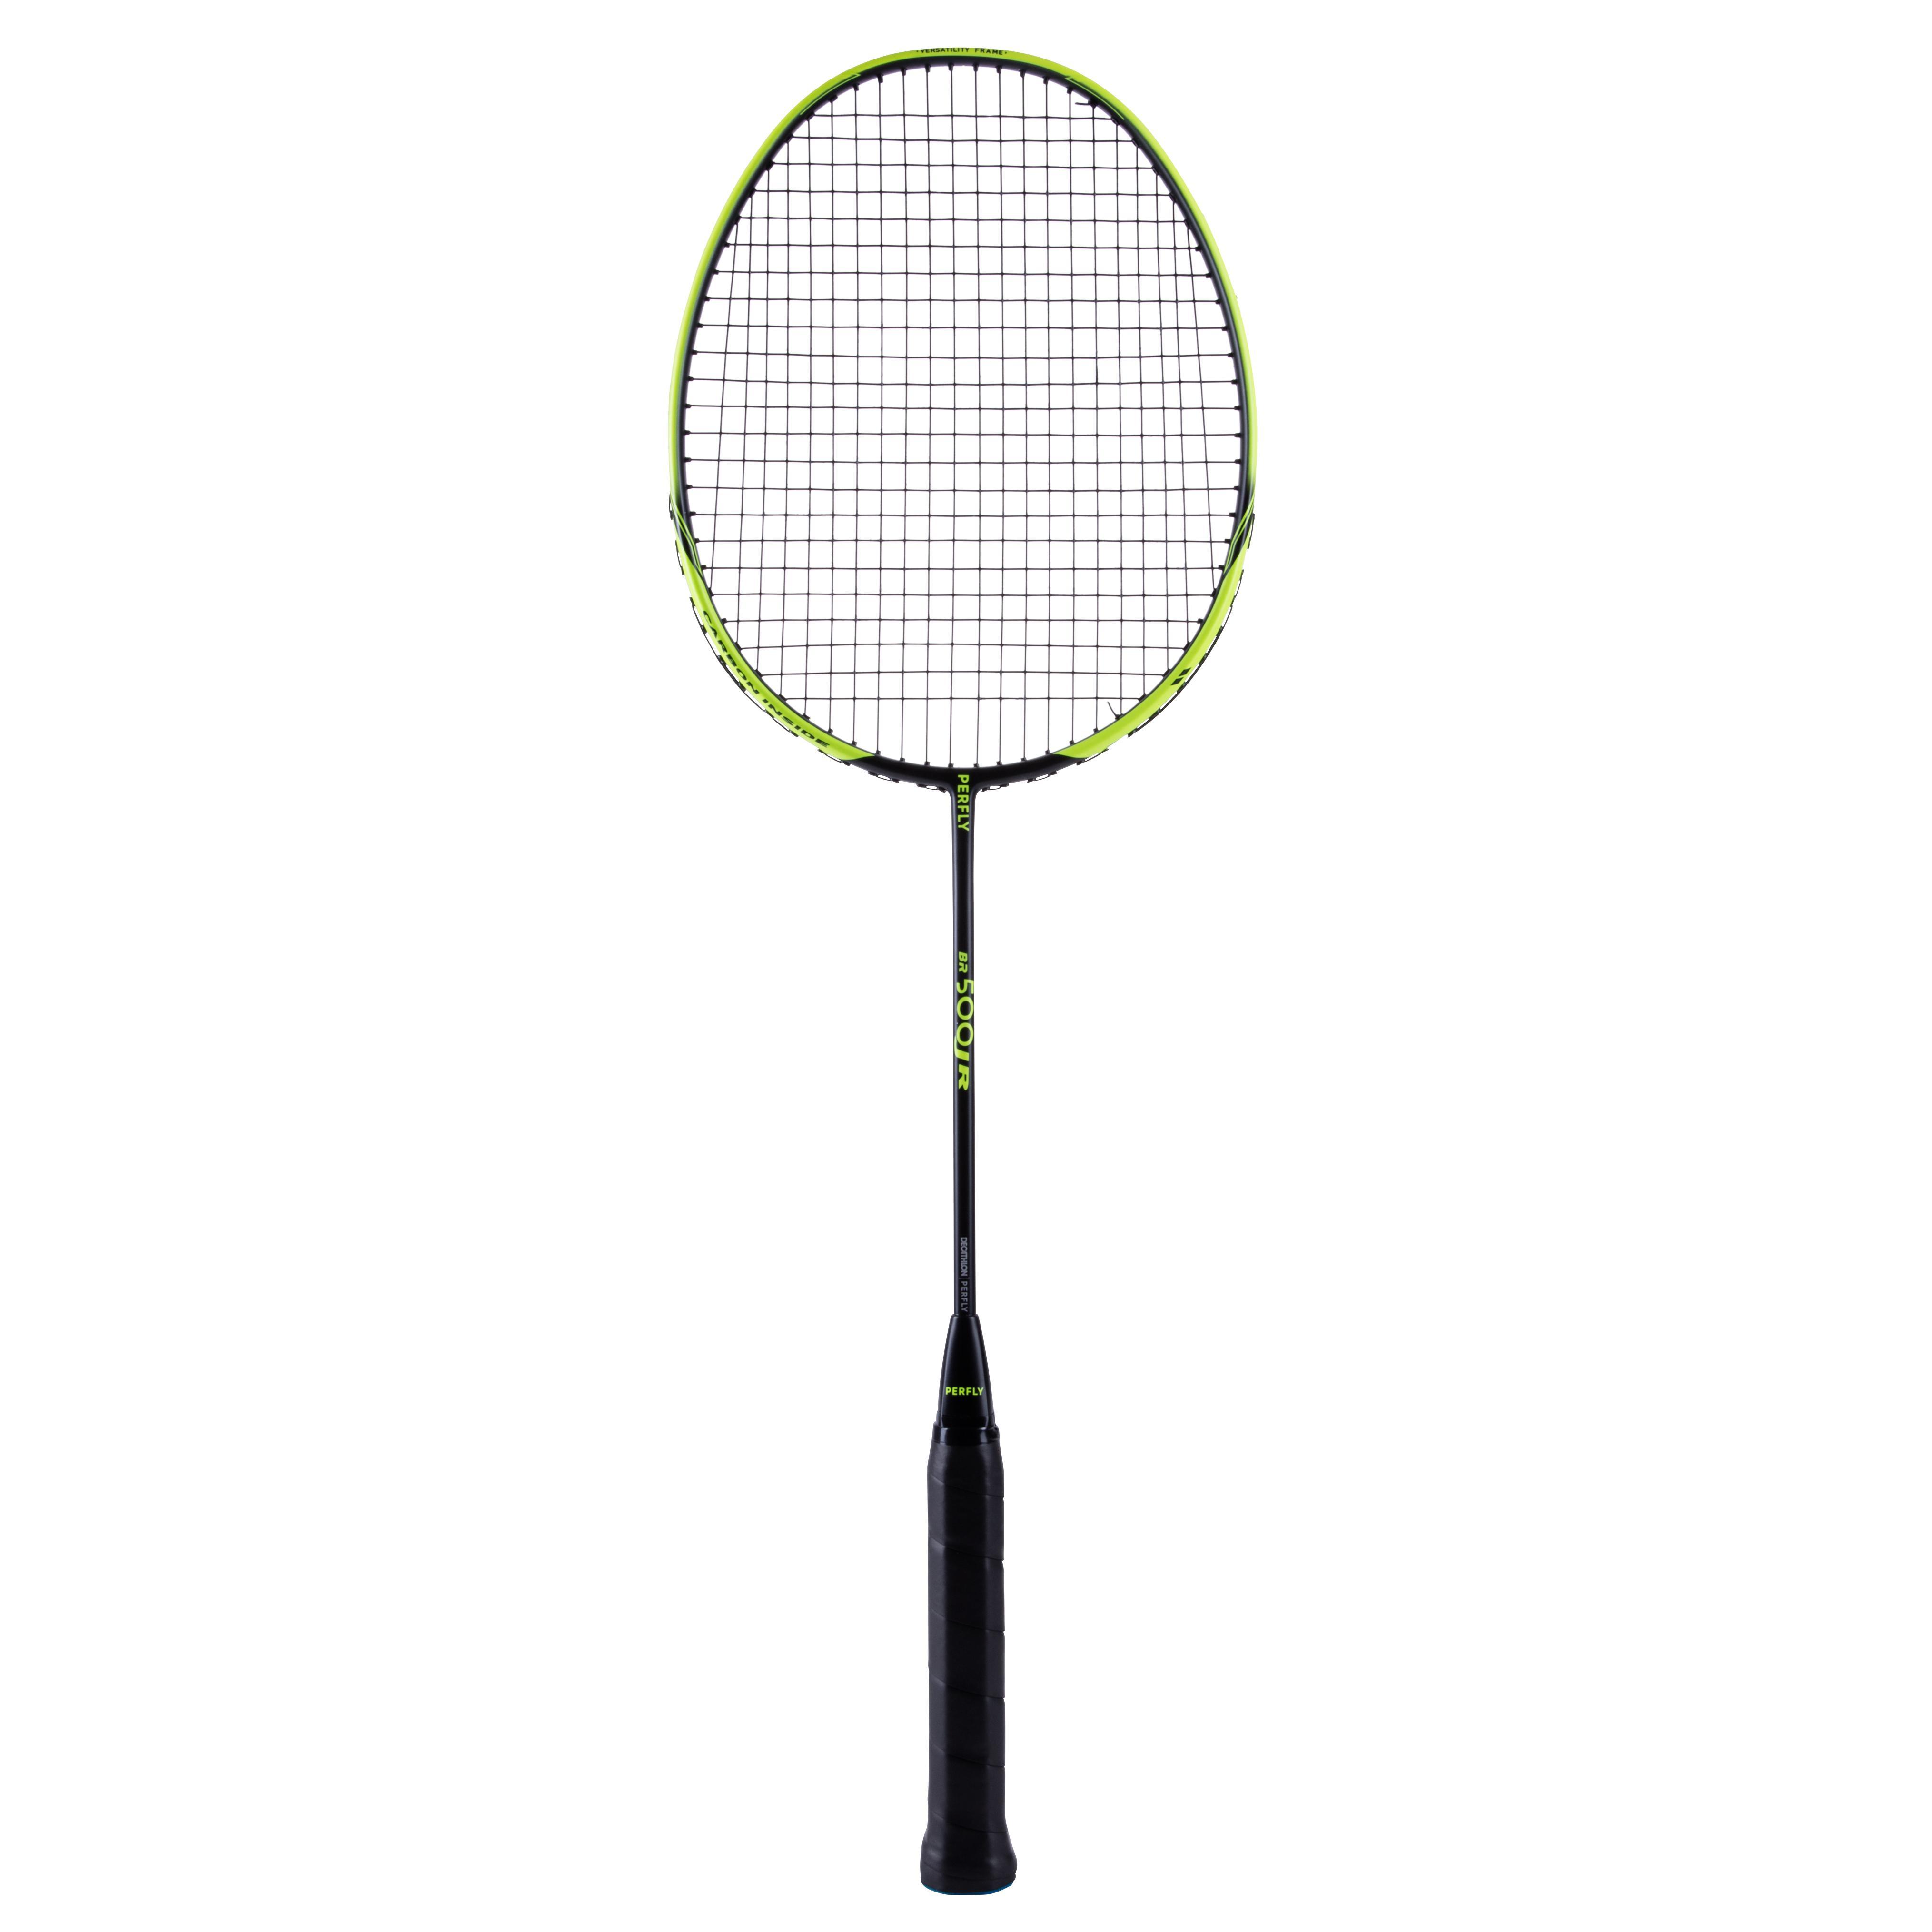 Rachetă Badminton BR 500 Copii imagine produs